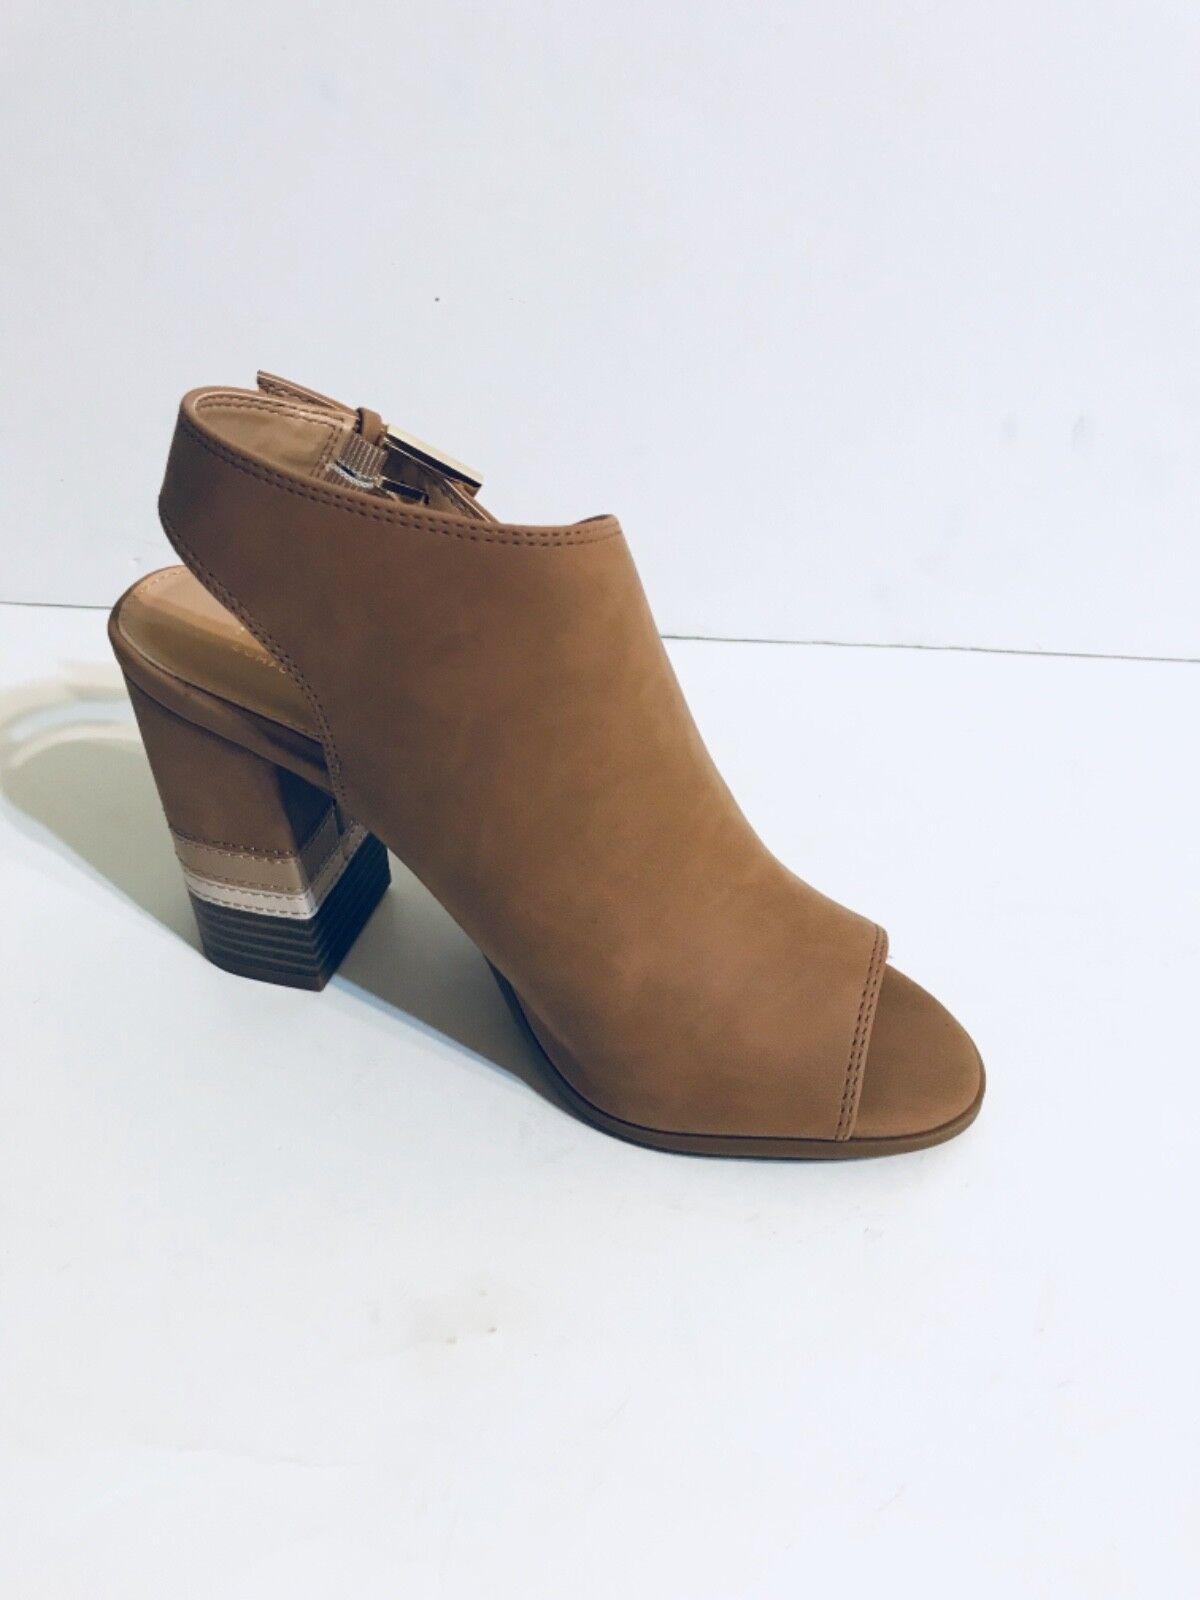 Apt.9 PROFESSION Femme Peep Toe Cheville Boot-taille 7-Cognac -